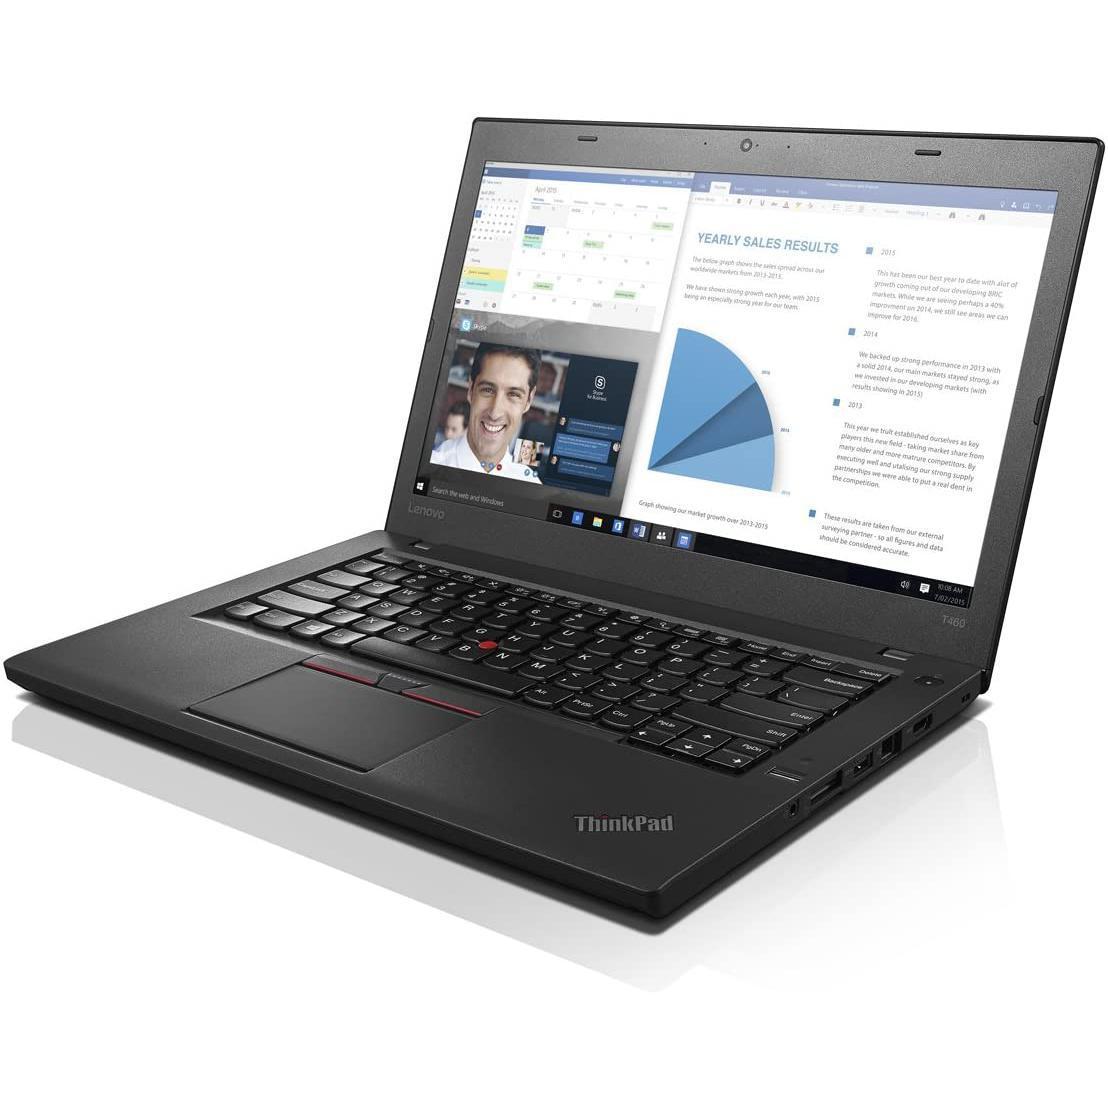 Lenovo ThinkPad T460 14-inch (2016) - Core i5-6300U - 16 GB - SSD 192 GB